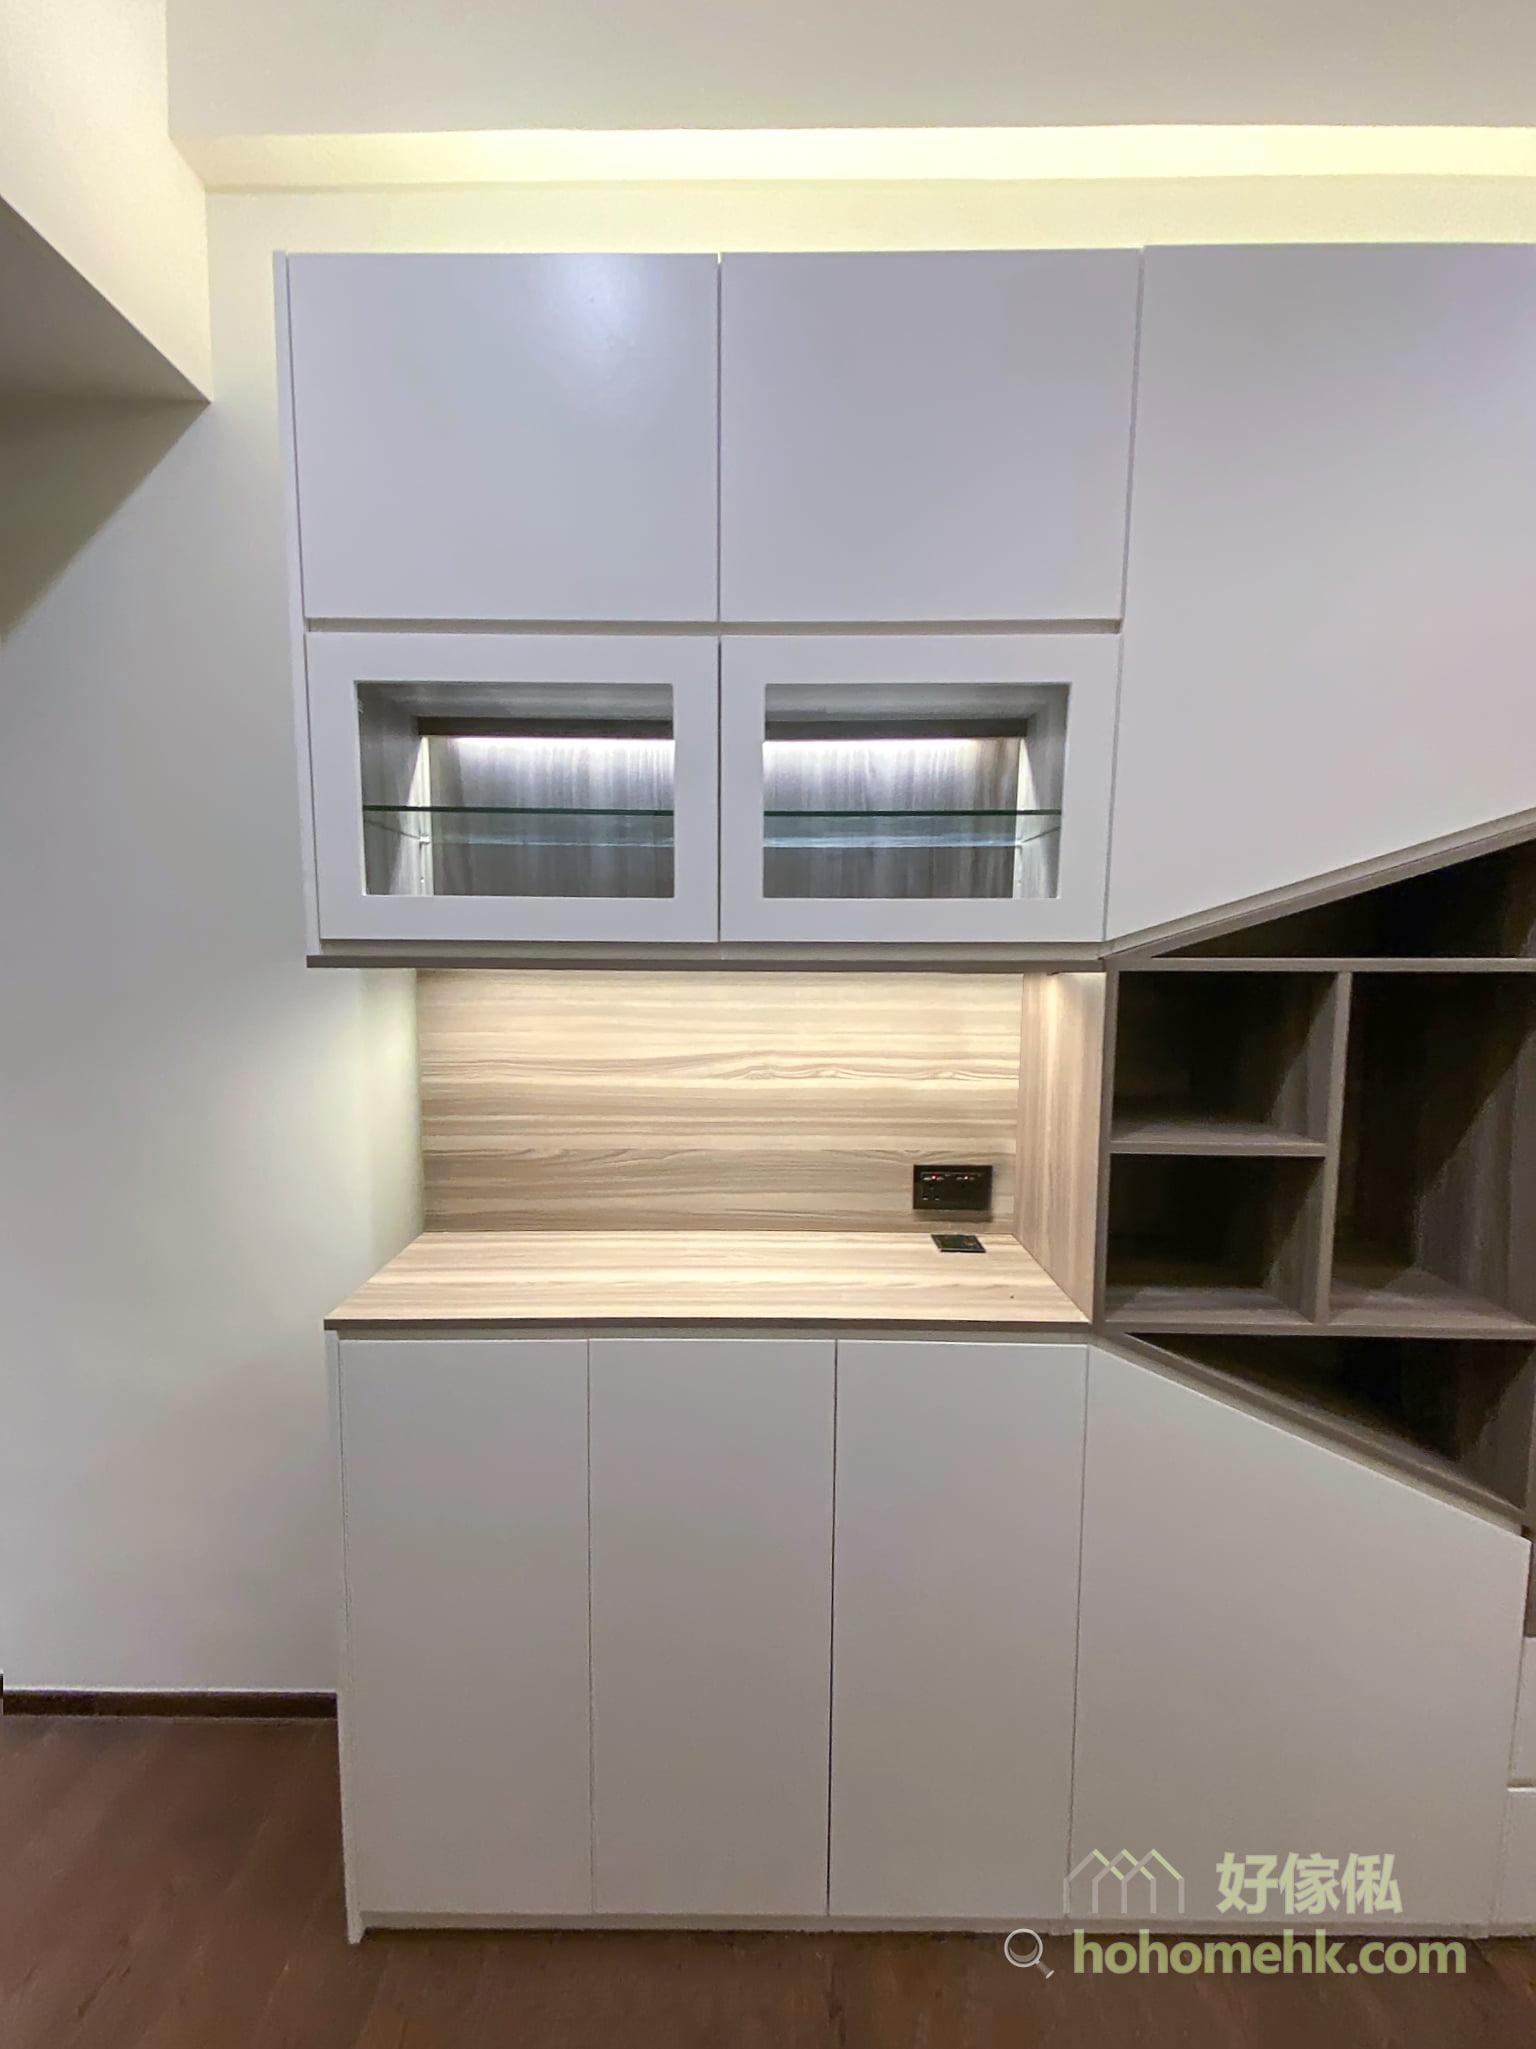 5500k-6000k的冷白光,亮度更高,可讓視線及注意力集中,用於玻璃飾櫃,有引導視線的功用,可讓放在飾櫃內的擺設更突出。而3000k的暖黃光,亮度較低,為室內空間營造溫暖柔和的氣氛